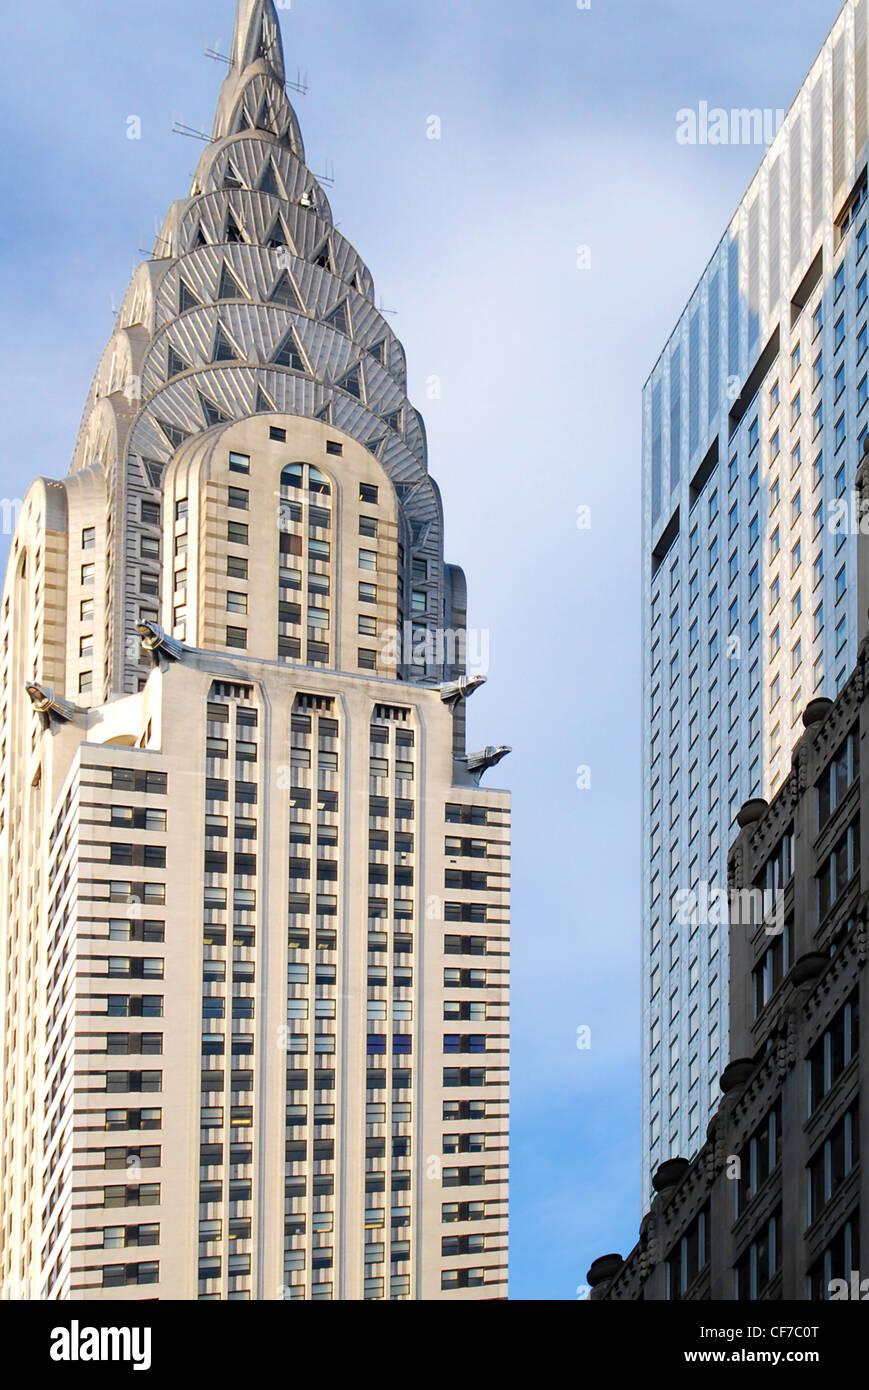 The Chrysler Building in Manhattan, New York City. - Stock Image